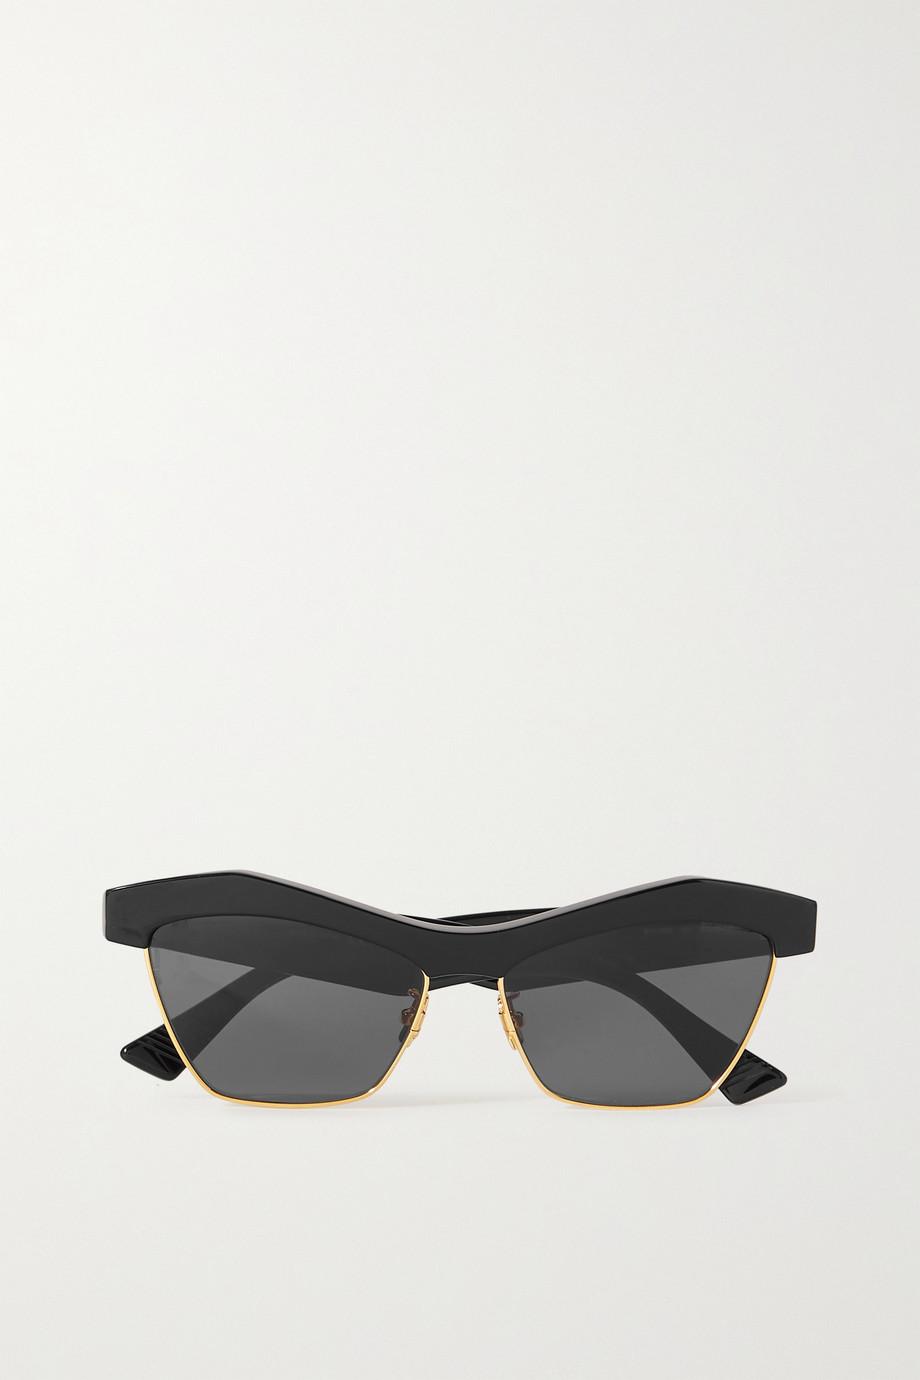 Bottega Veneta Cat-eye acetate and gold-tone sunglasses